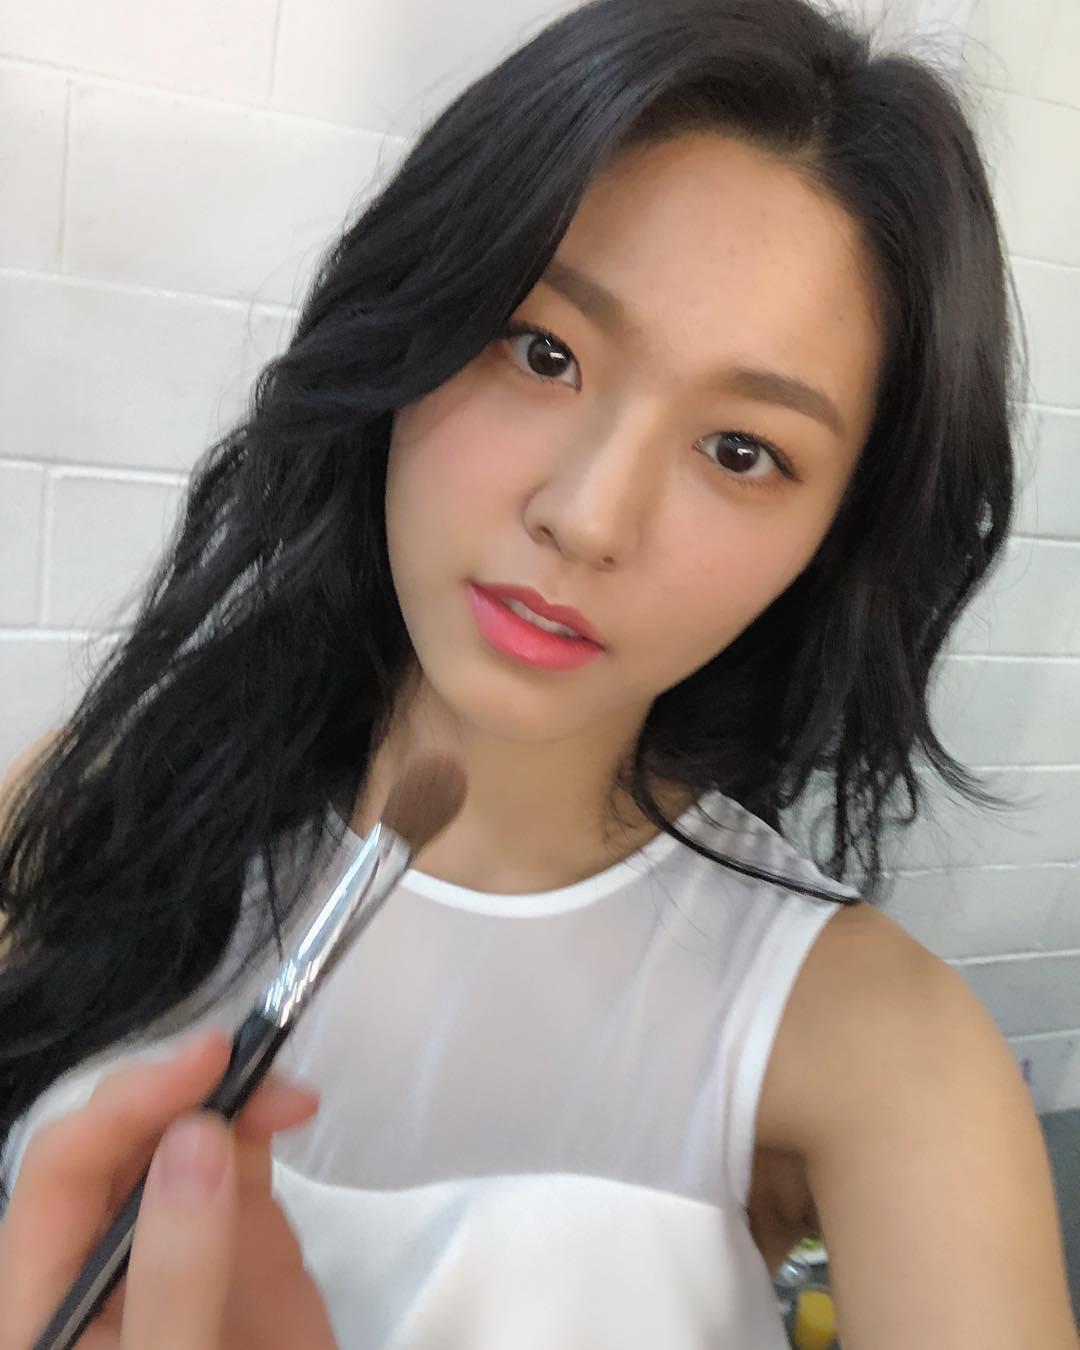 # AOA - 雪炫